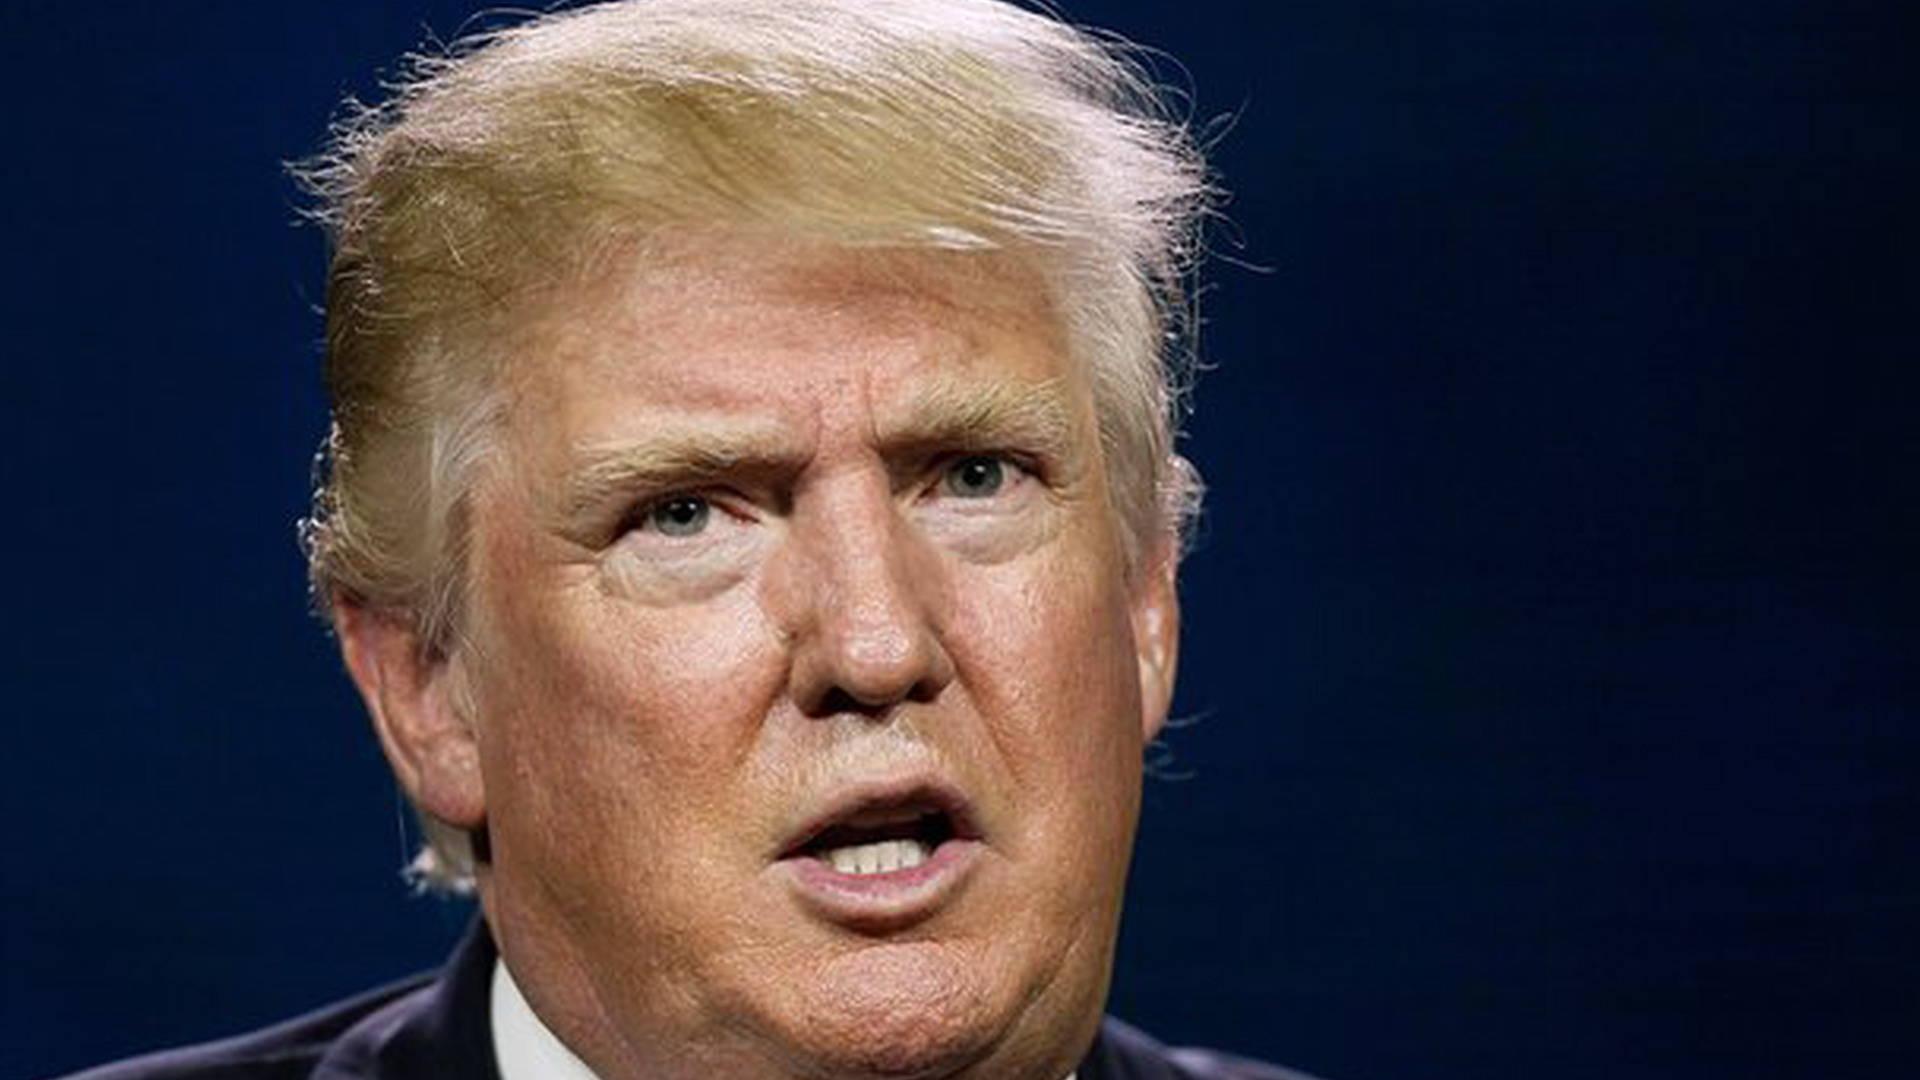 Lawsuit Alleging Trump Raped 13-Year-Old Child Refiled in ...